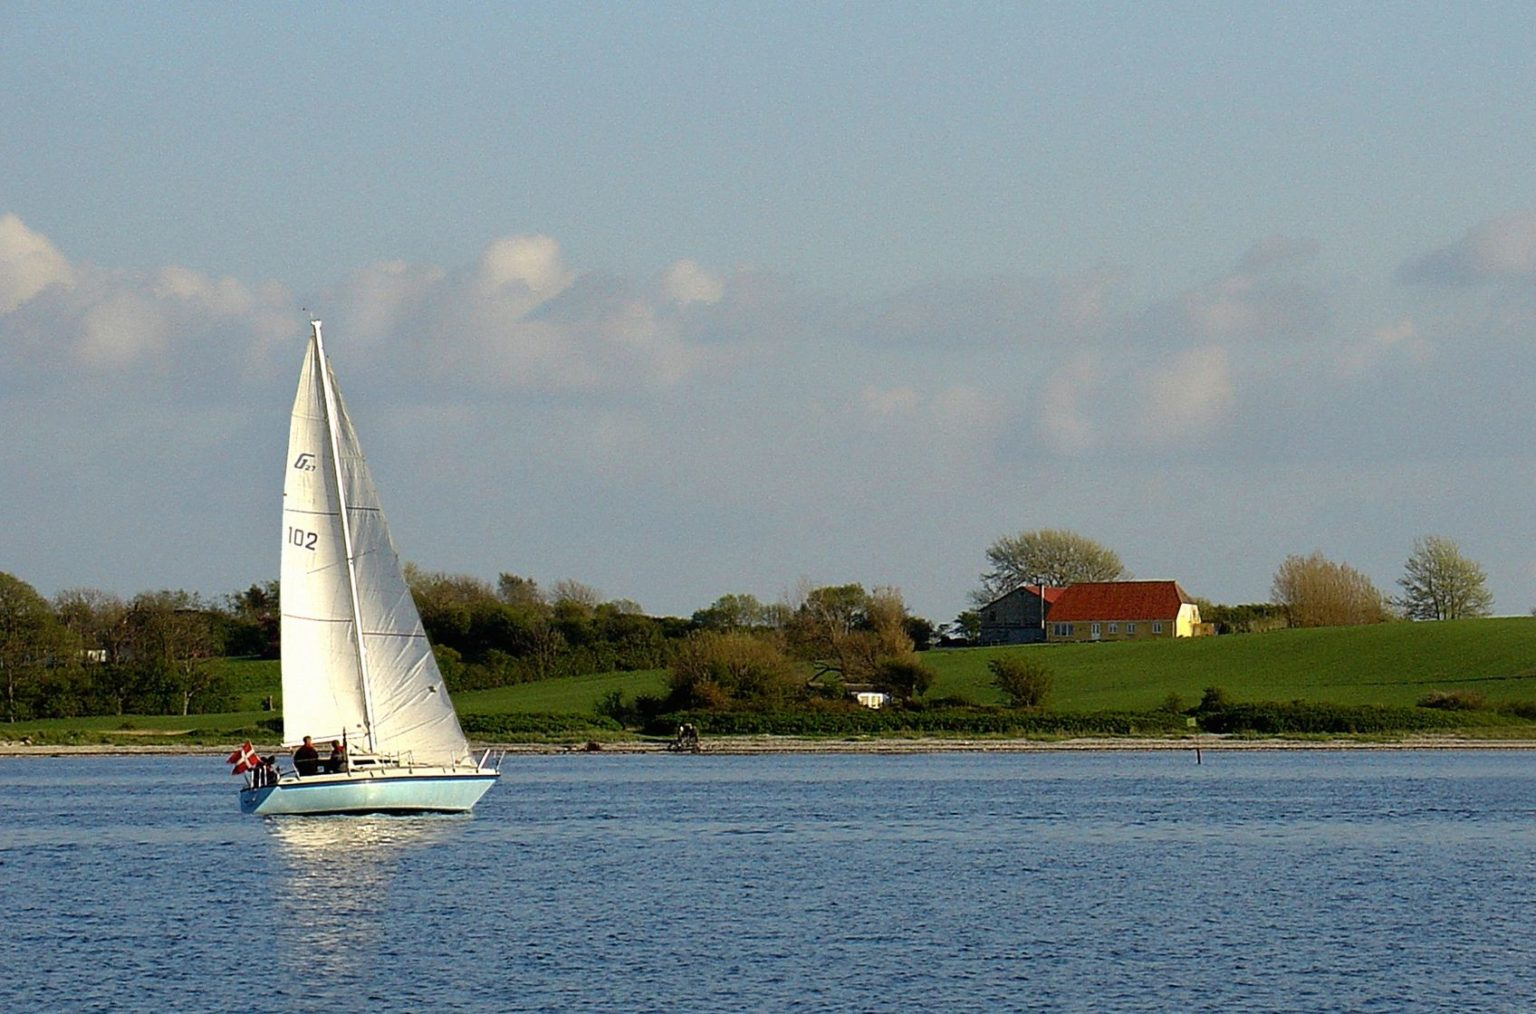 Moraine Sailing Club Hosting Meeting Saturday